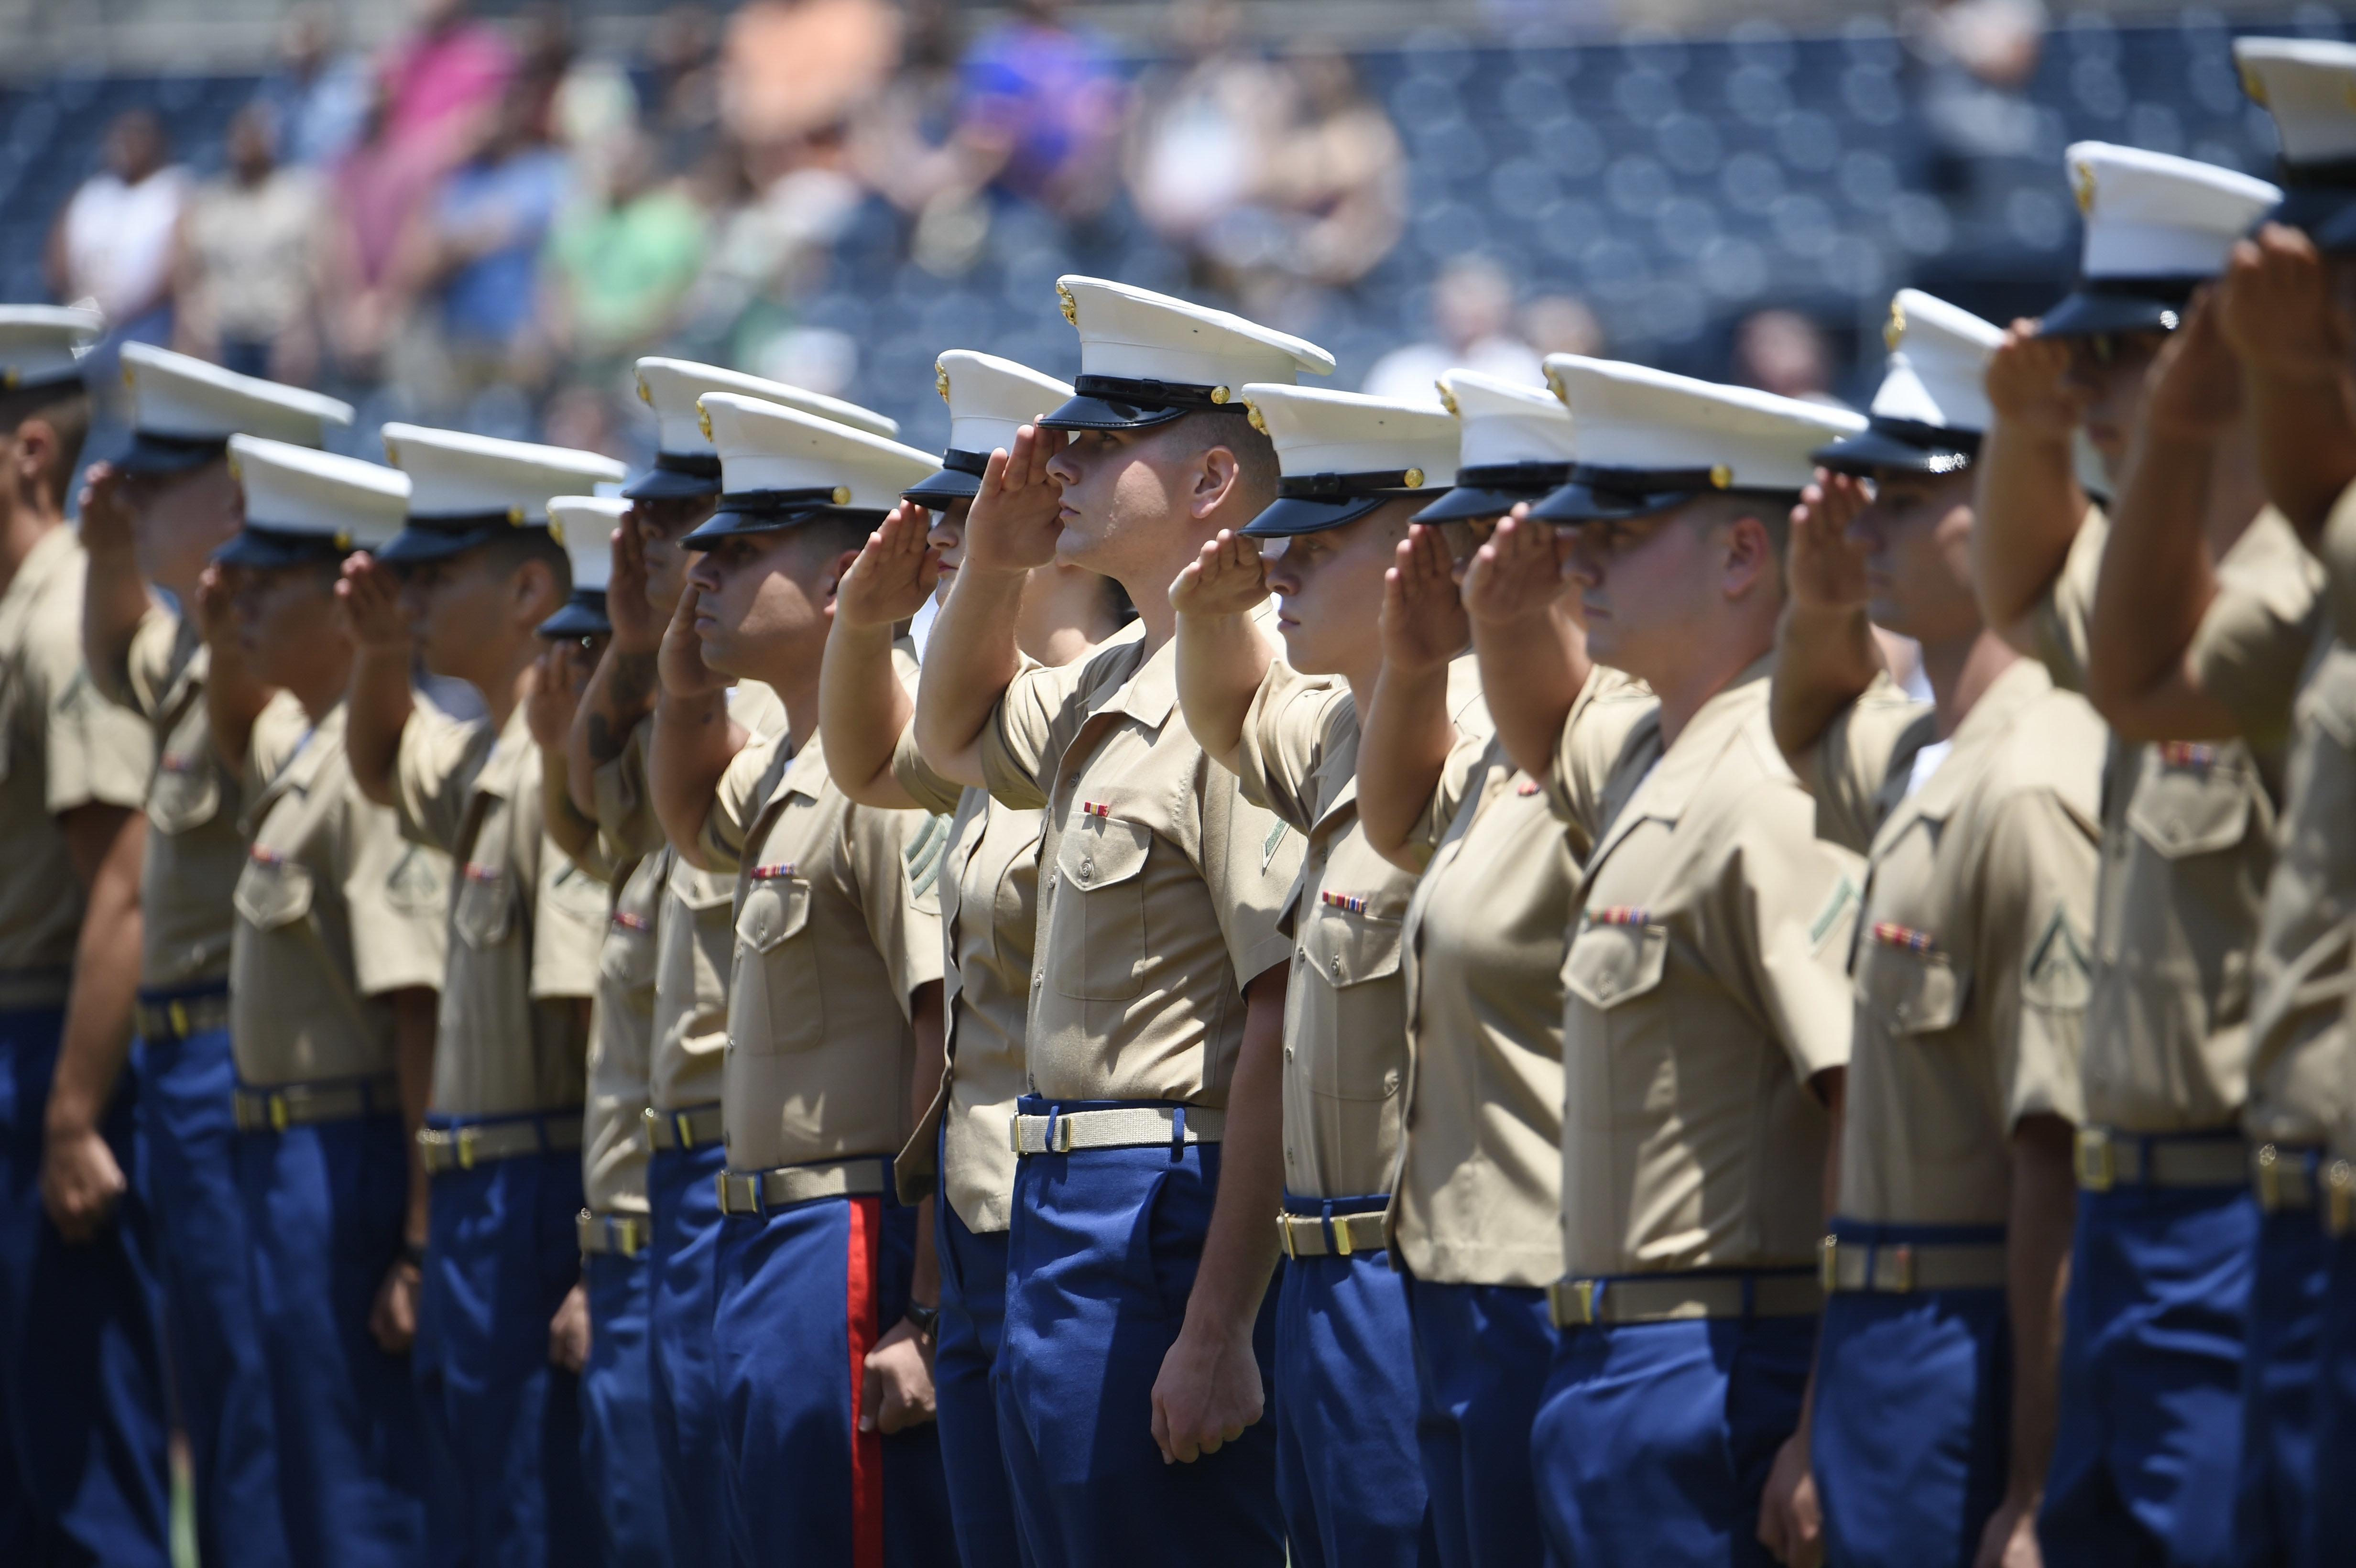 93 female marines write letter urging service to address rampant